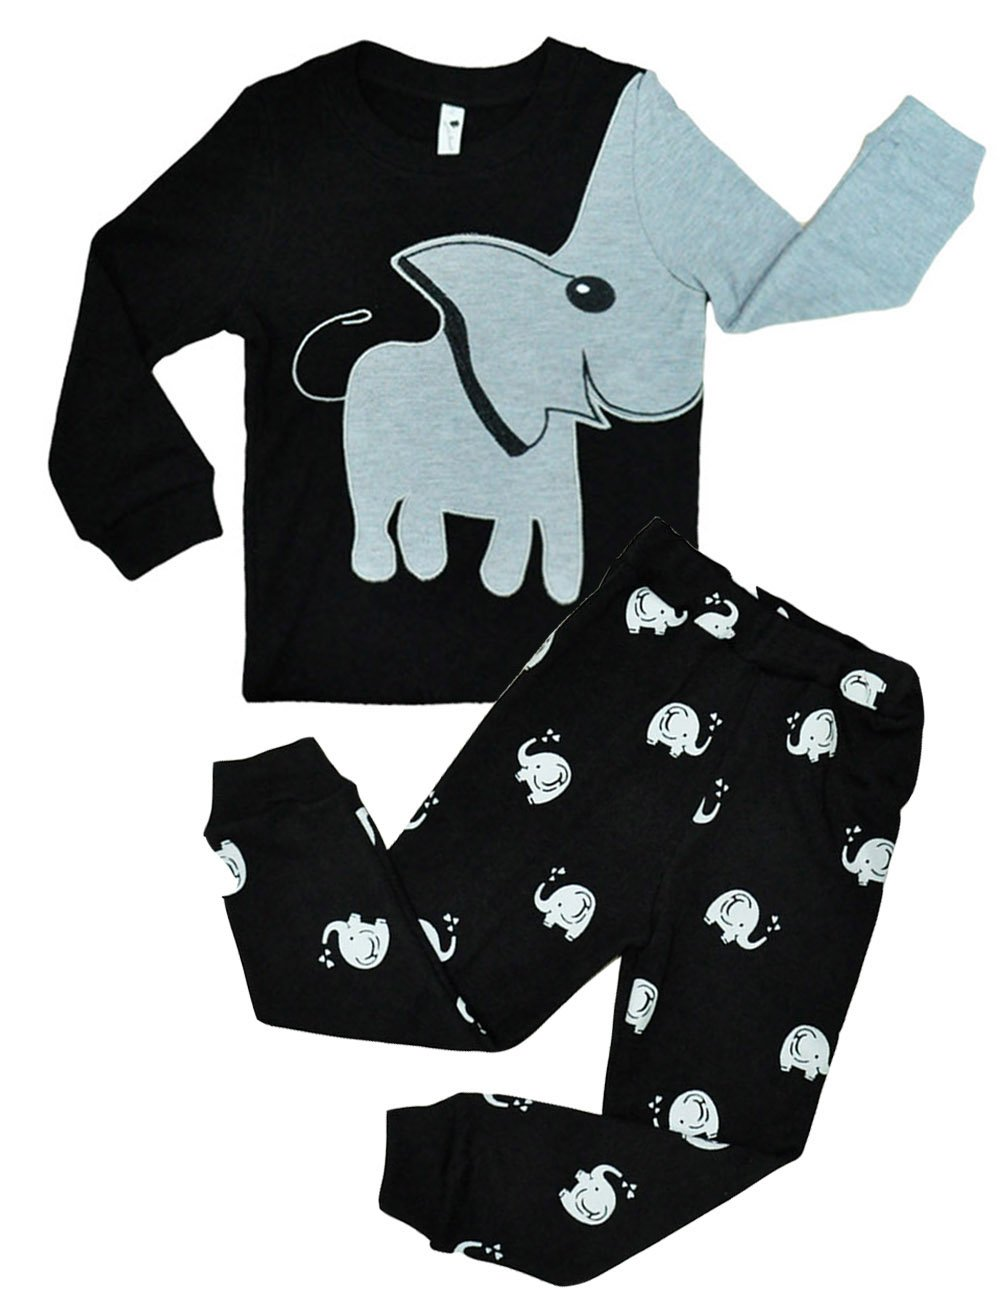 Tkria - Pijama para Niños de Dinosaurio 1 Años - 7 Años 2